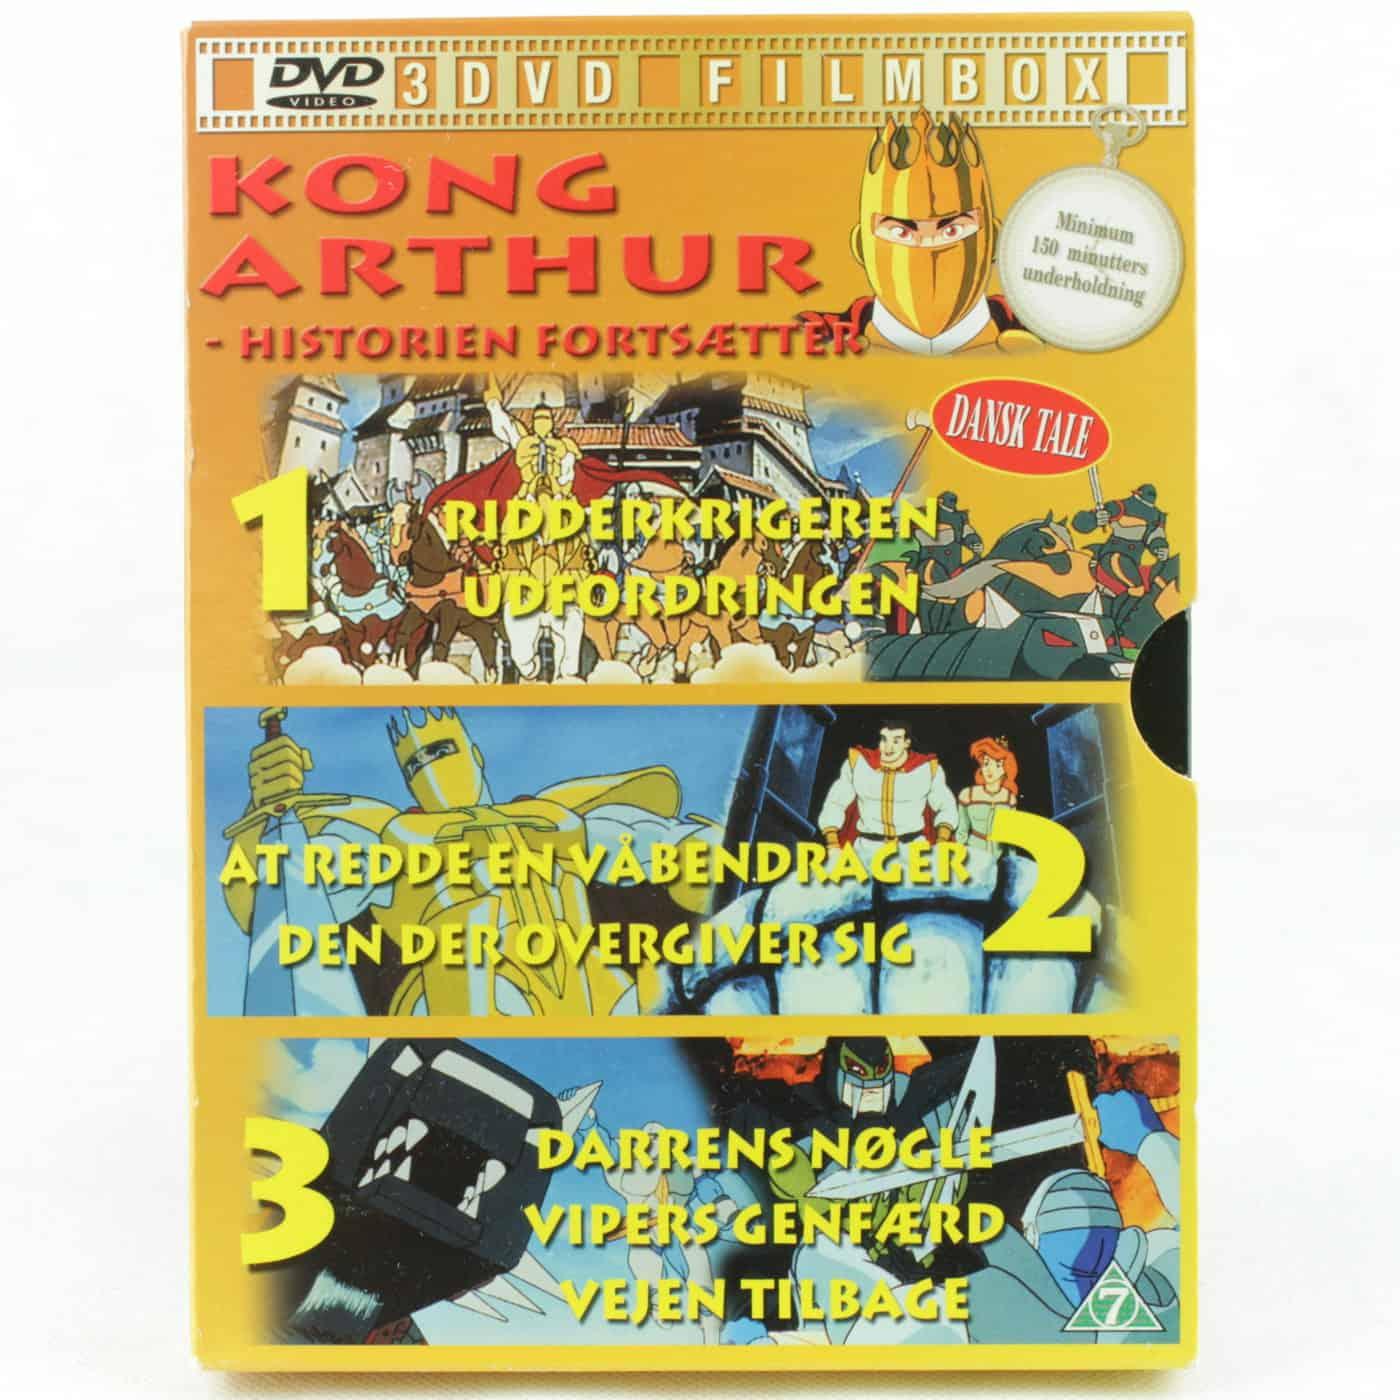 Kong Arthur 3 DVD Filmbox